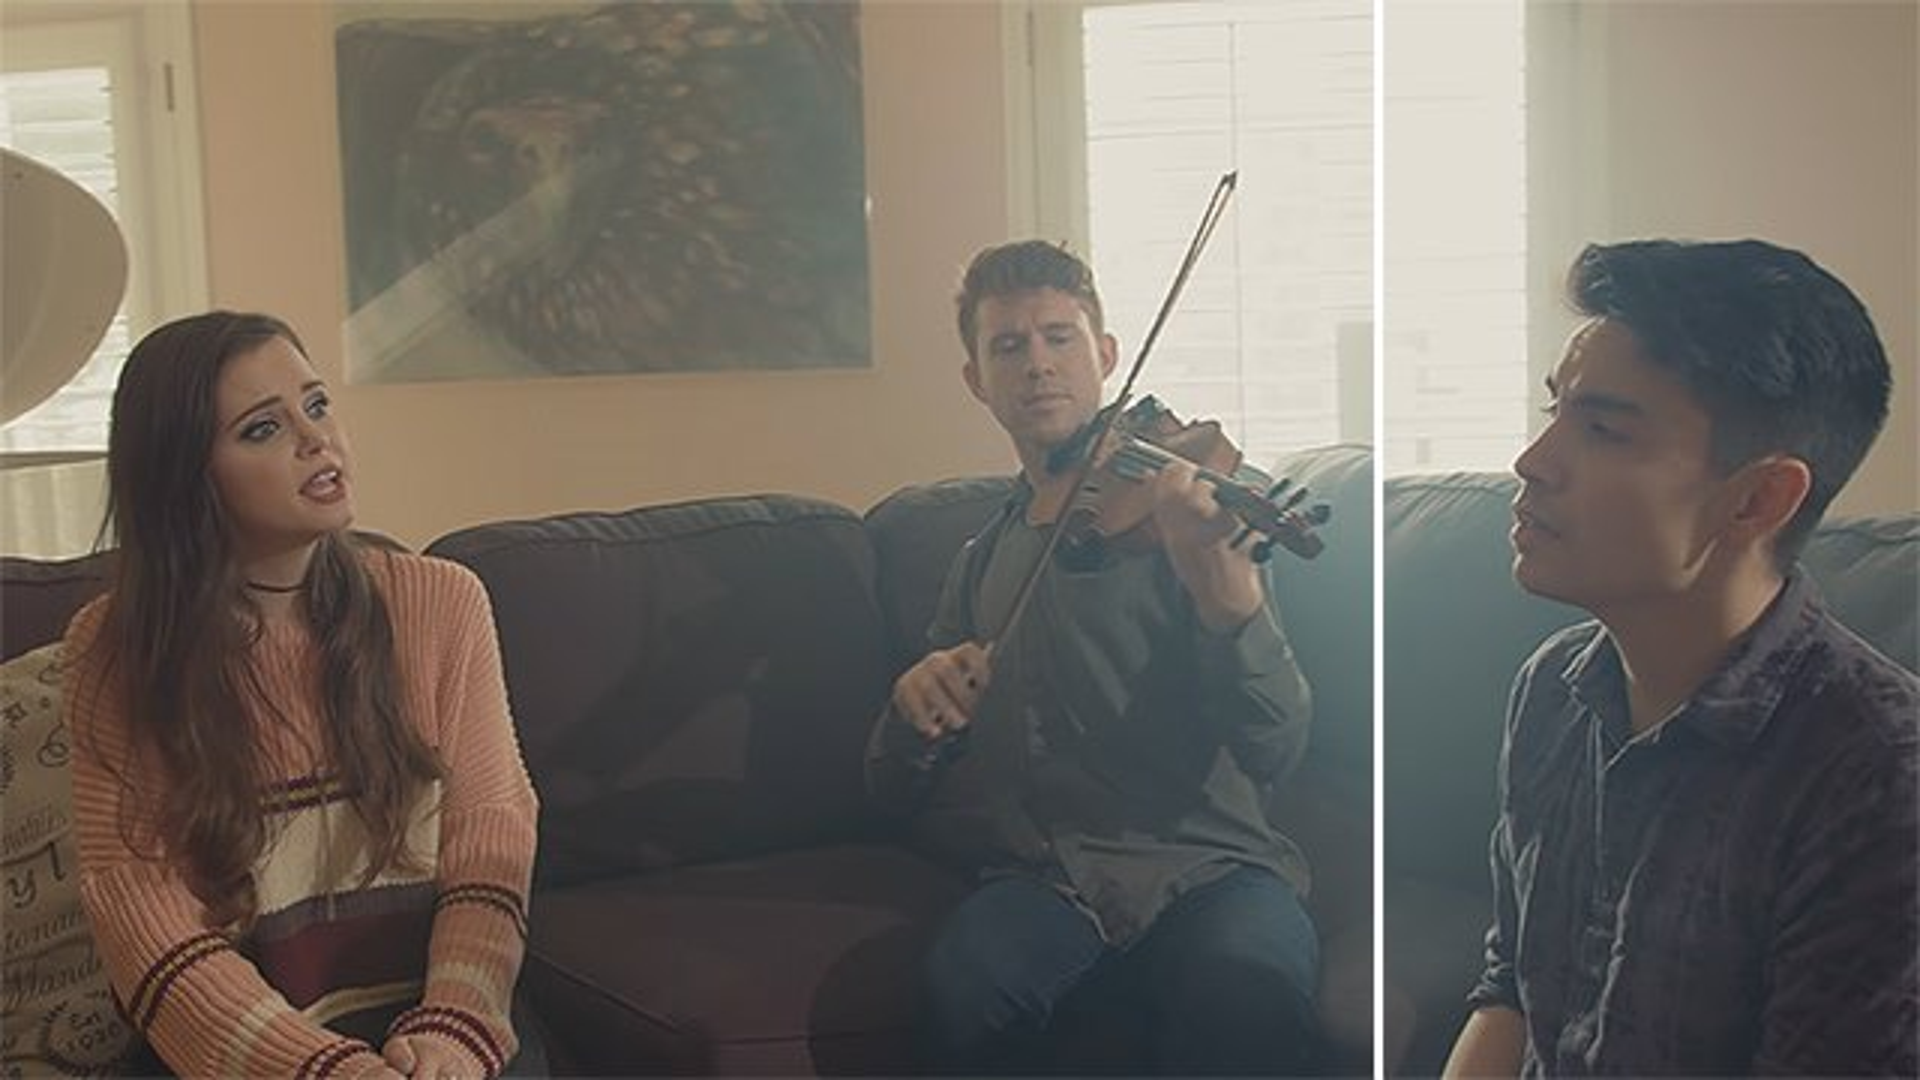 Christina-Grimmie-Sam-Tsui-Kurt-Hugo-Schneider-Tiffany-Alvord